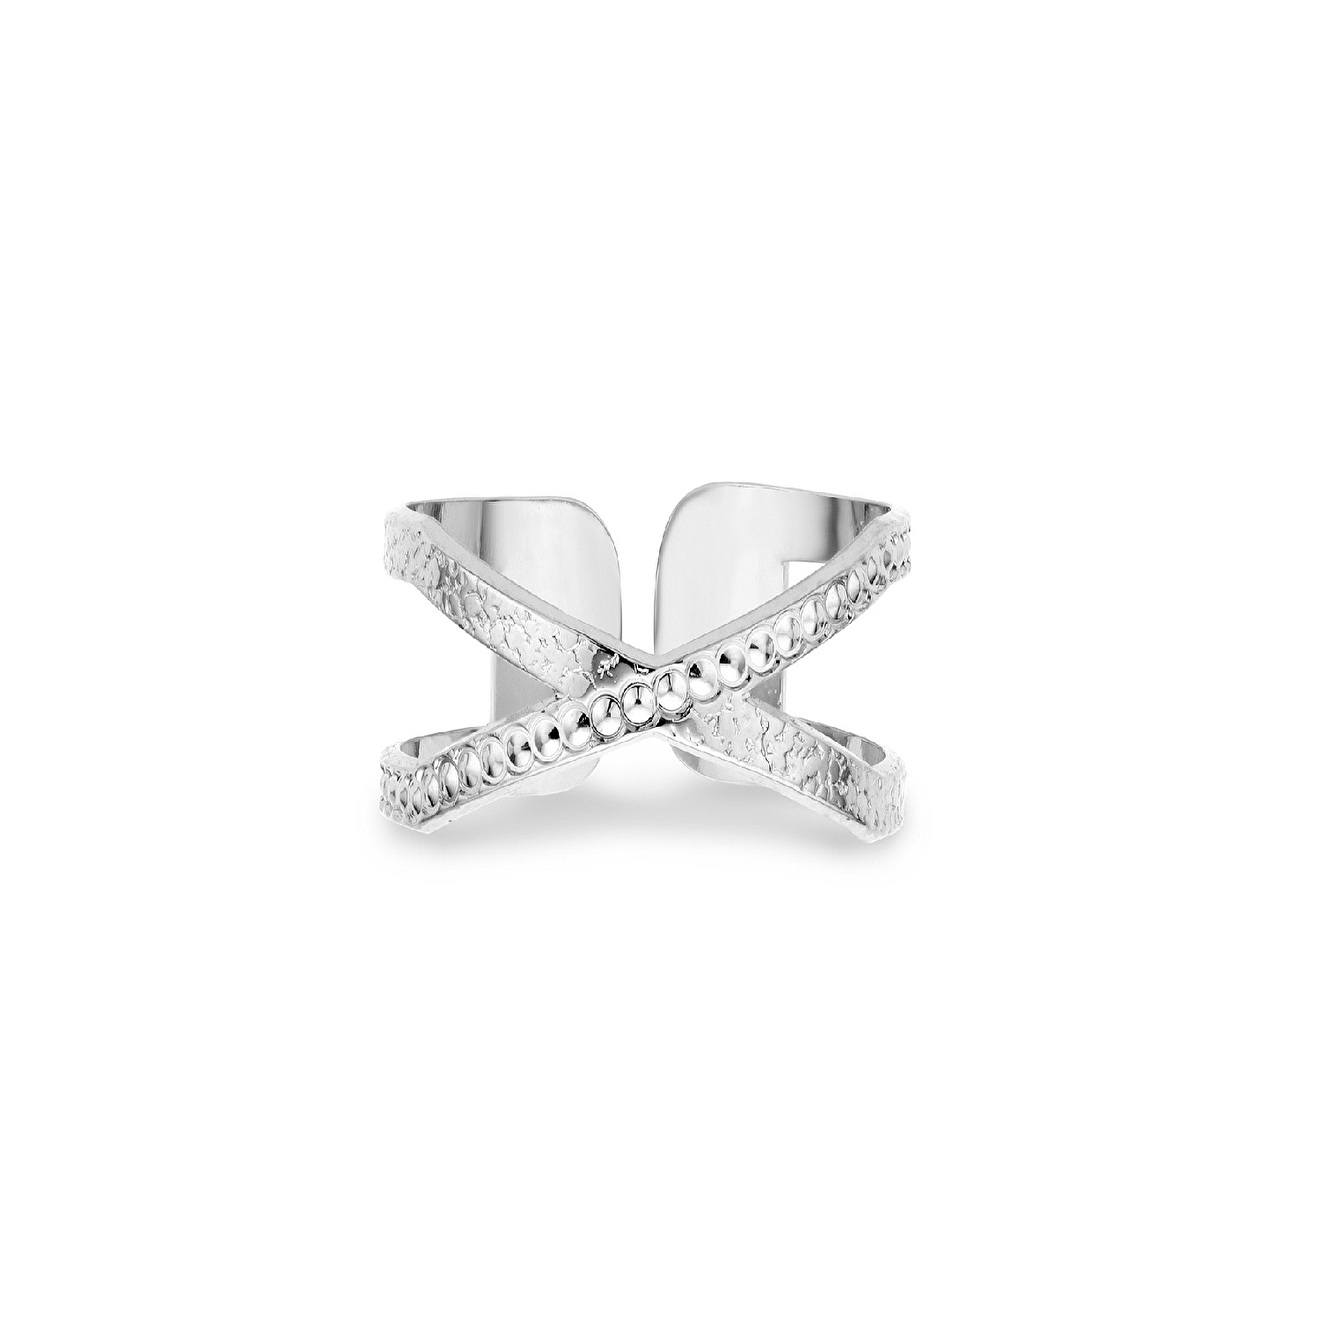 Mya Bay Покрытое серебром кольцо Soho-Perlée